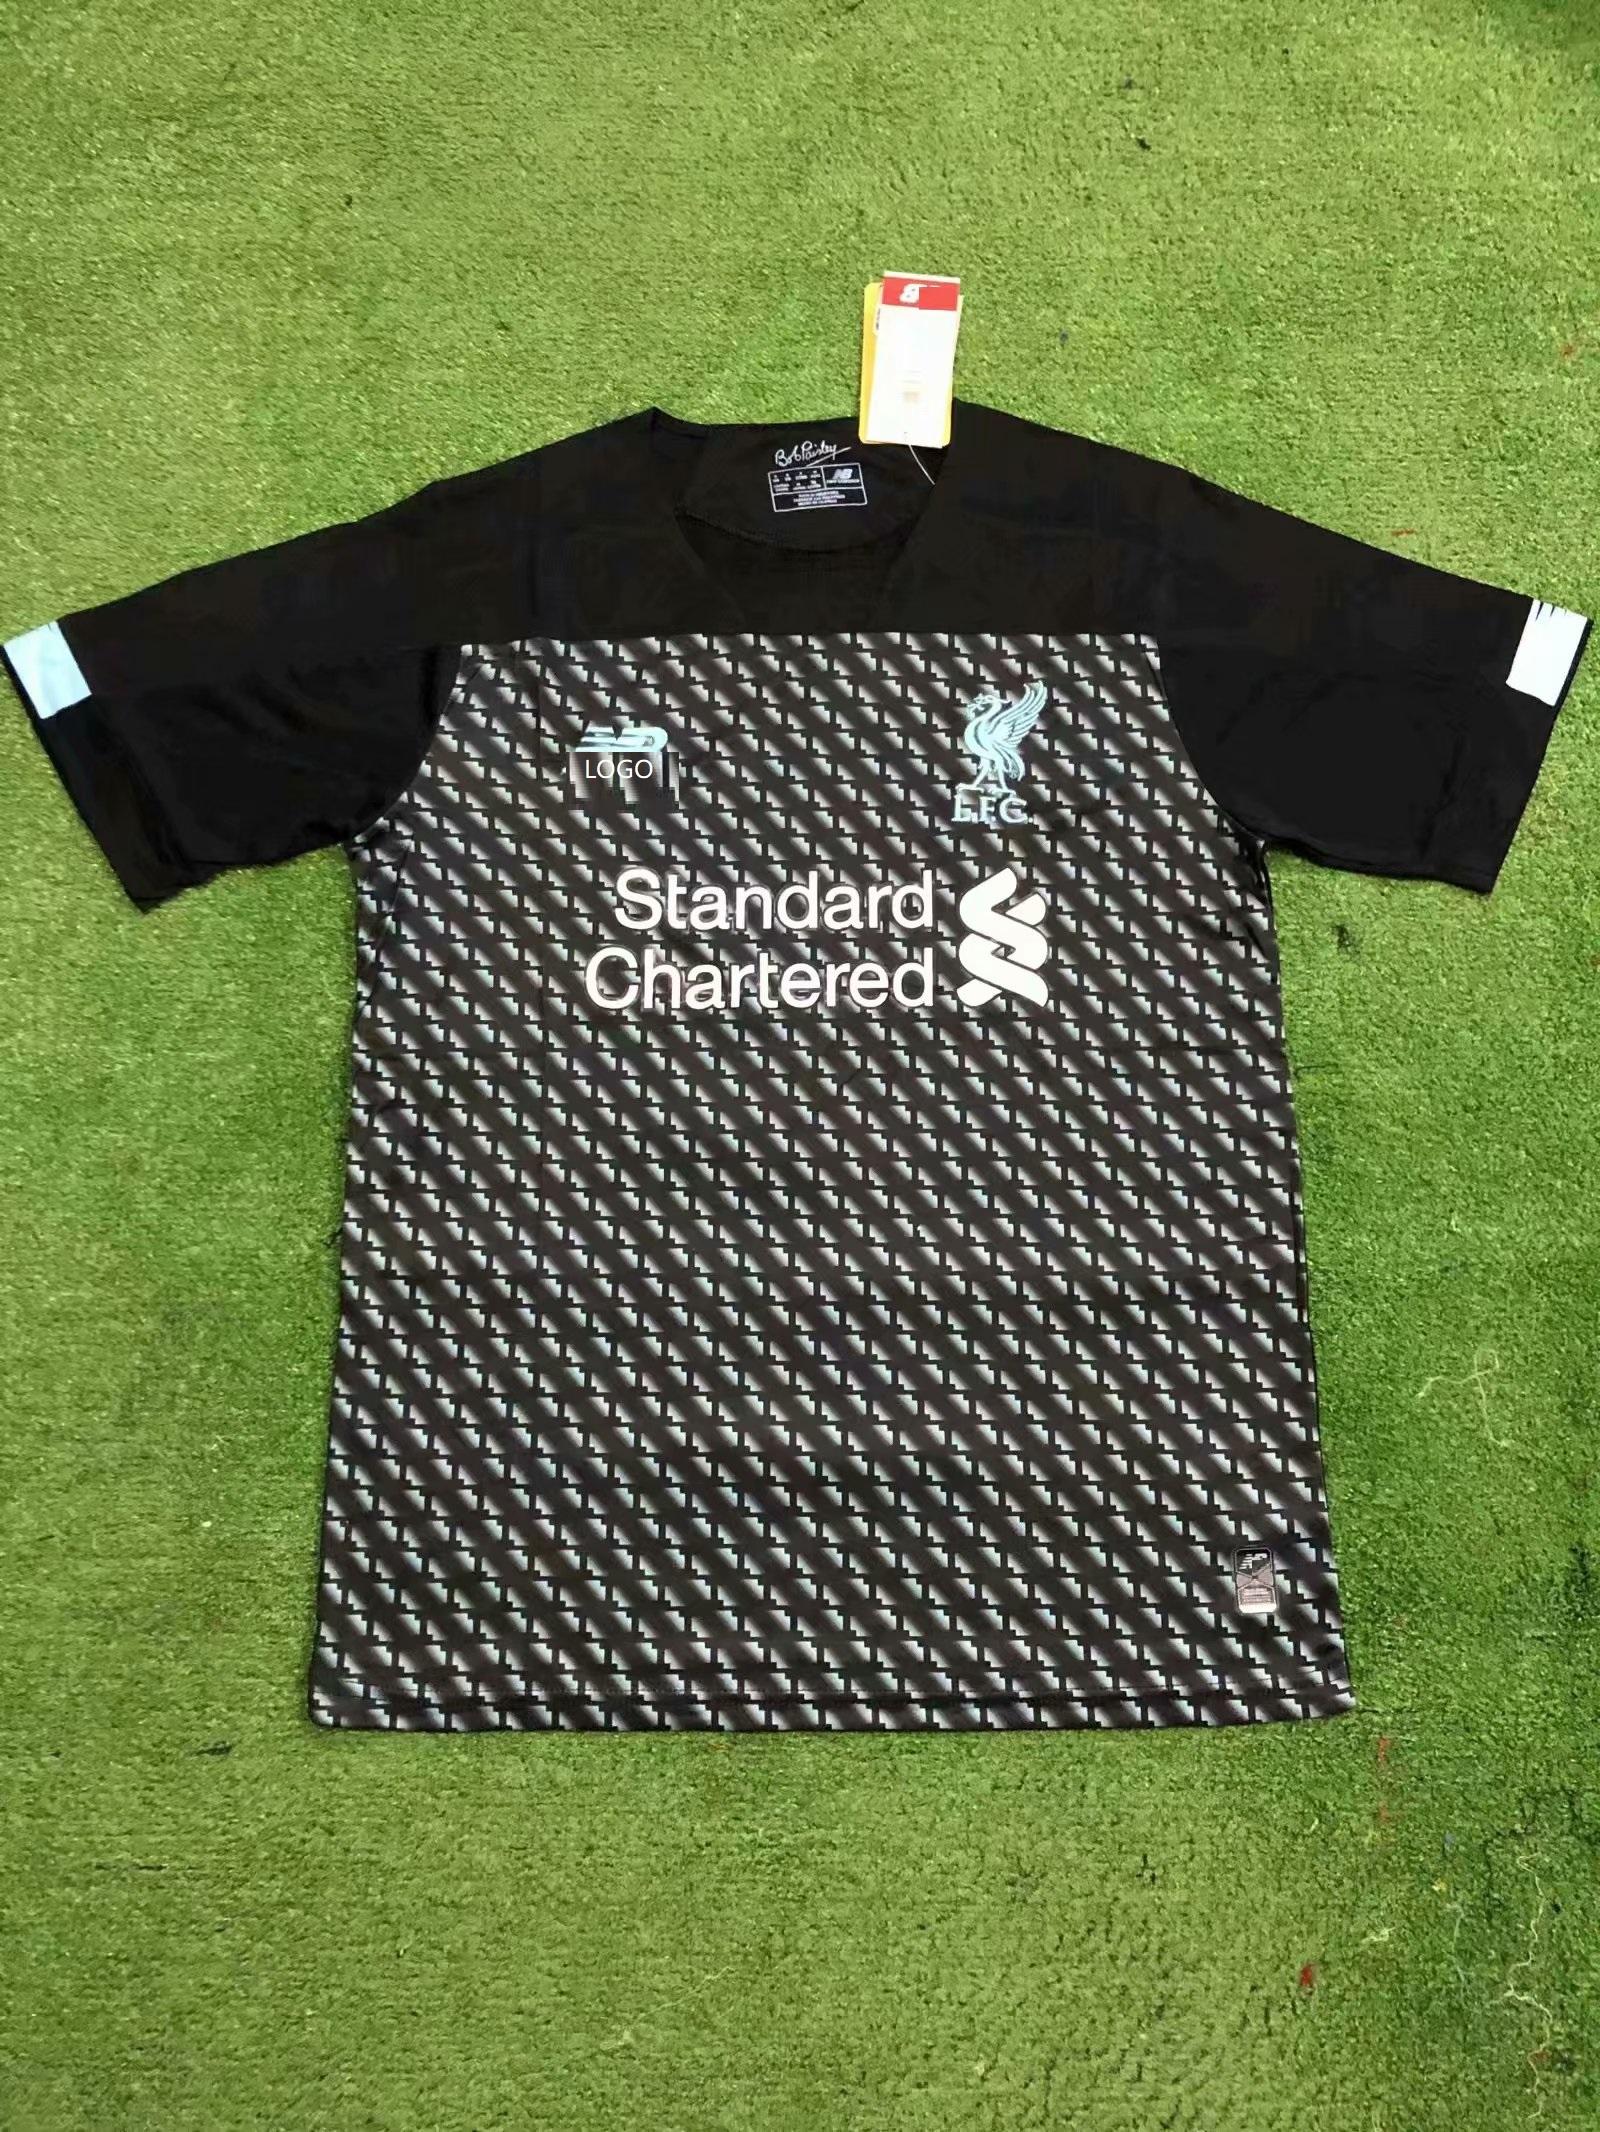 size 40 9d1eb 20eb0 2019/20 Adult thai version Liverpool tgird away soccer jersey